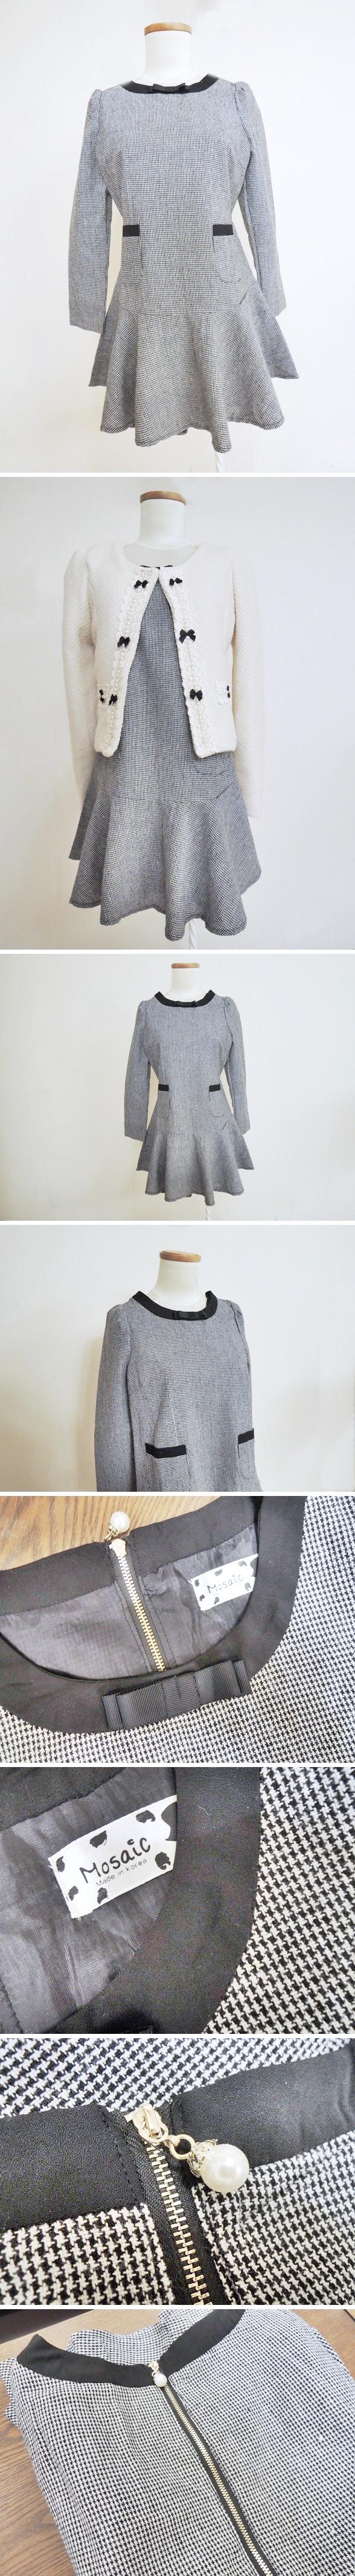 02 mosaic grey